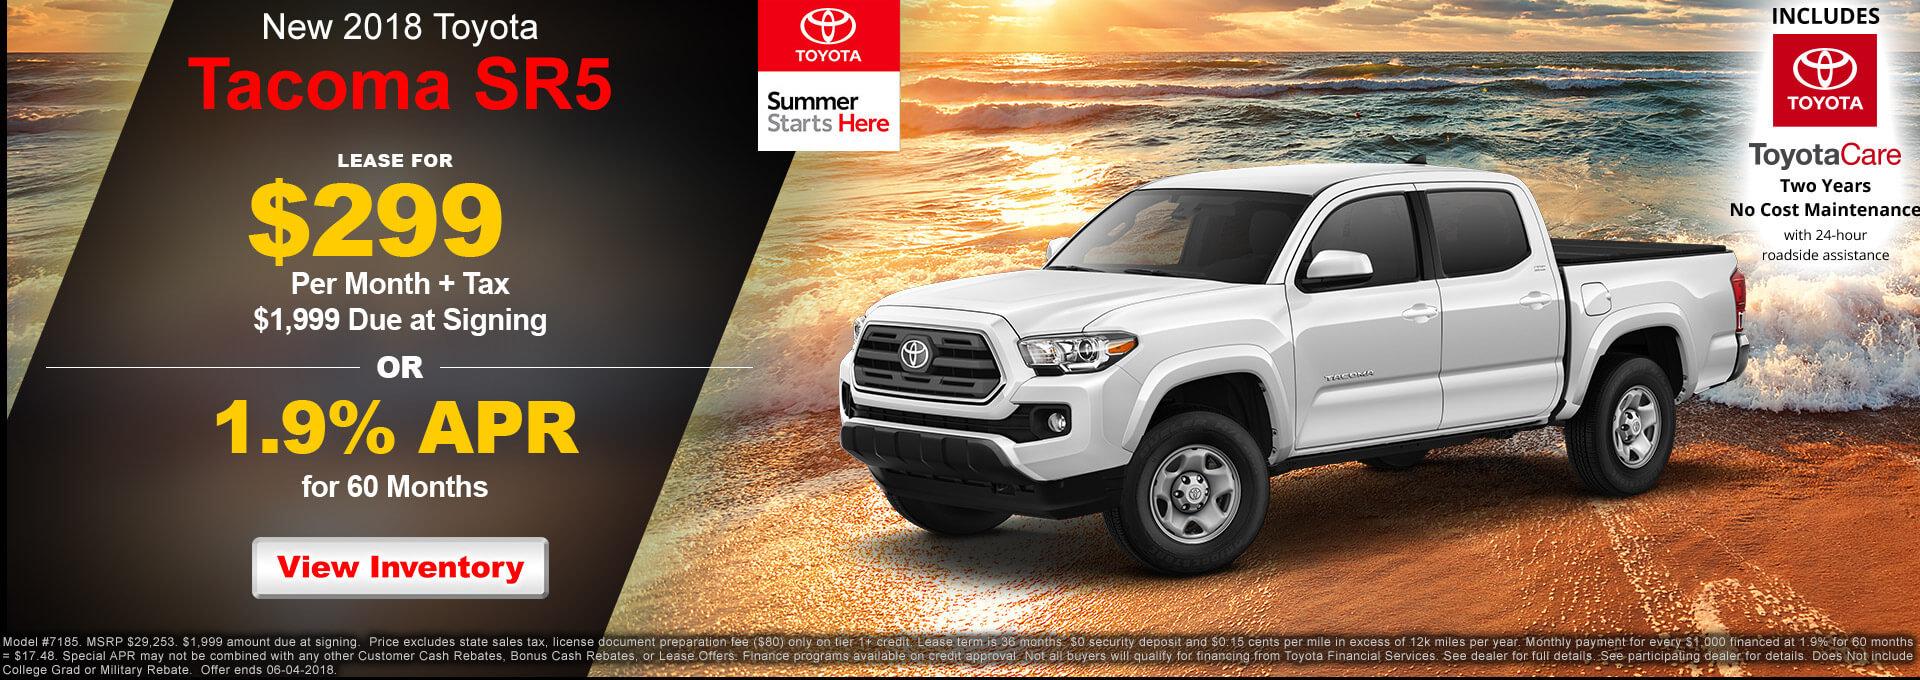 2018 Toyota Tacoma SR5 $299